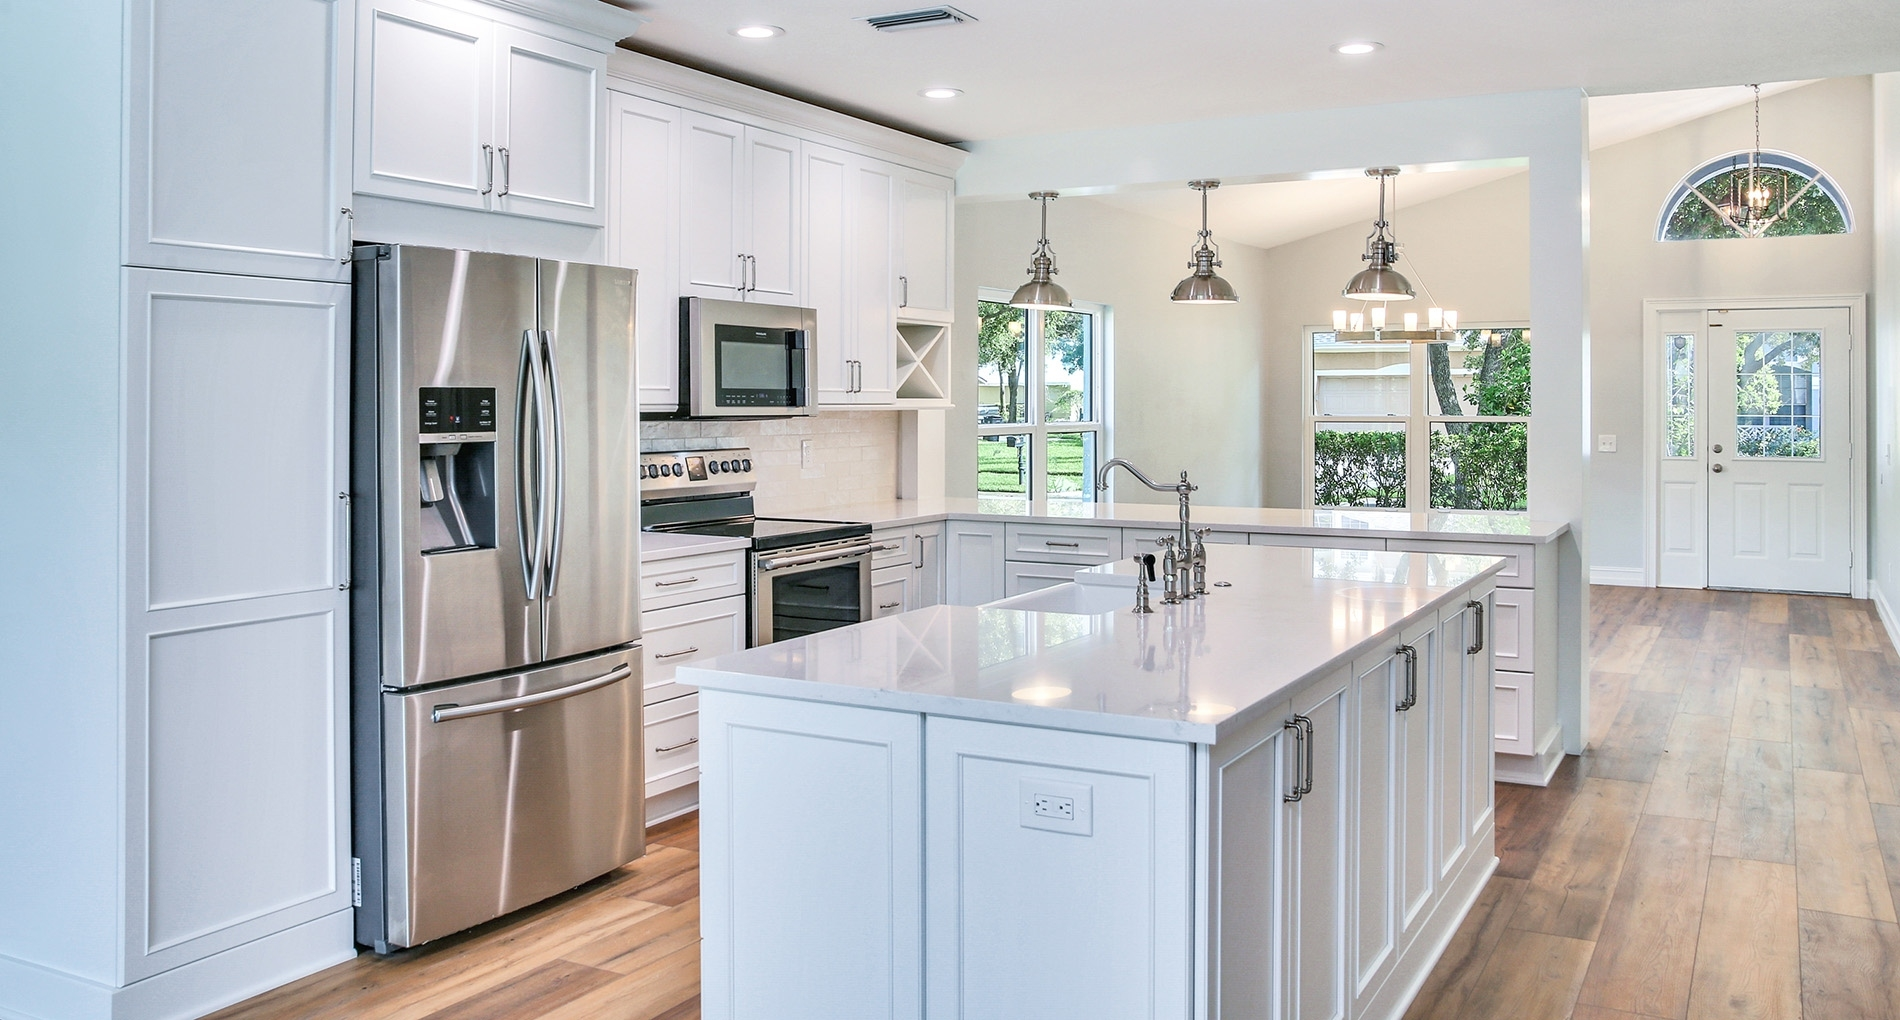 South Tampa Custom Kitchen Remodeling & Design   Alair pertaining to Kitchen Remodeling Tampa Fl